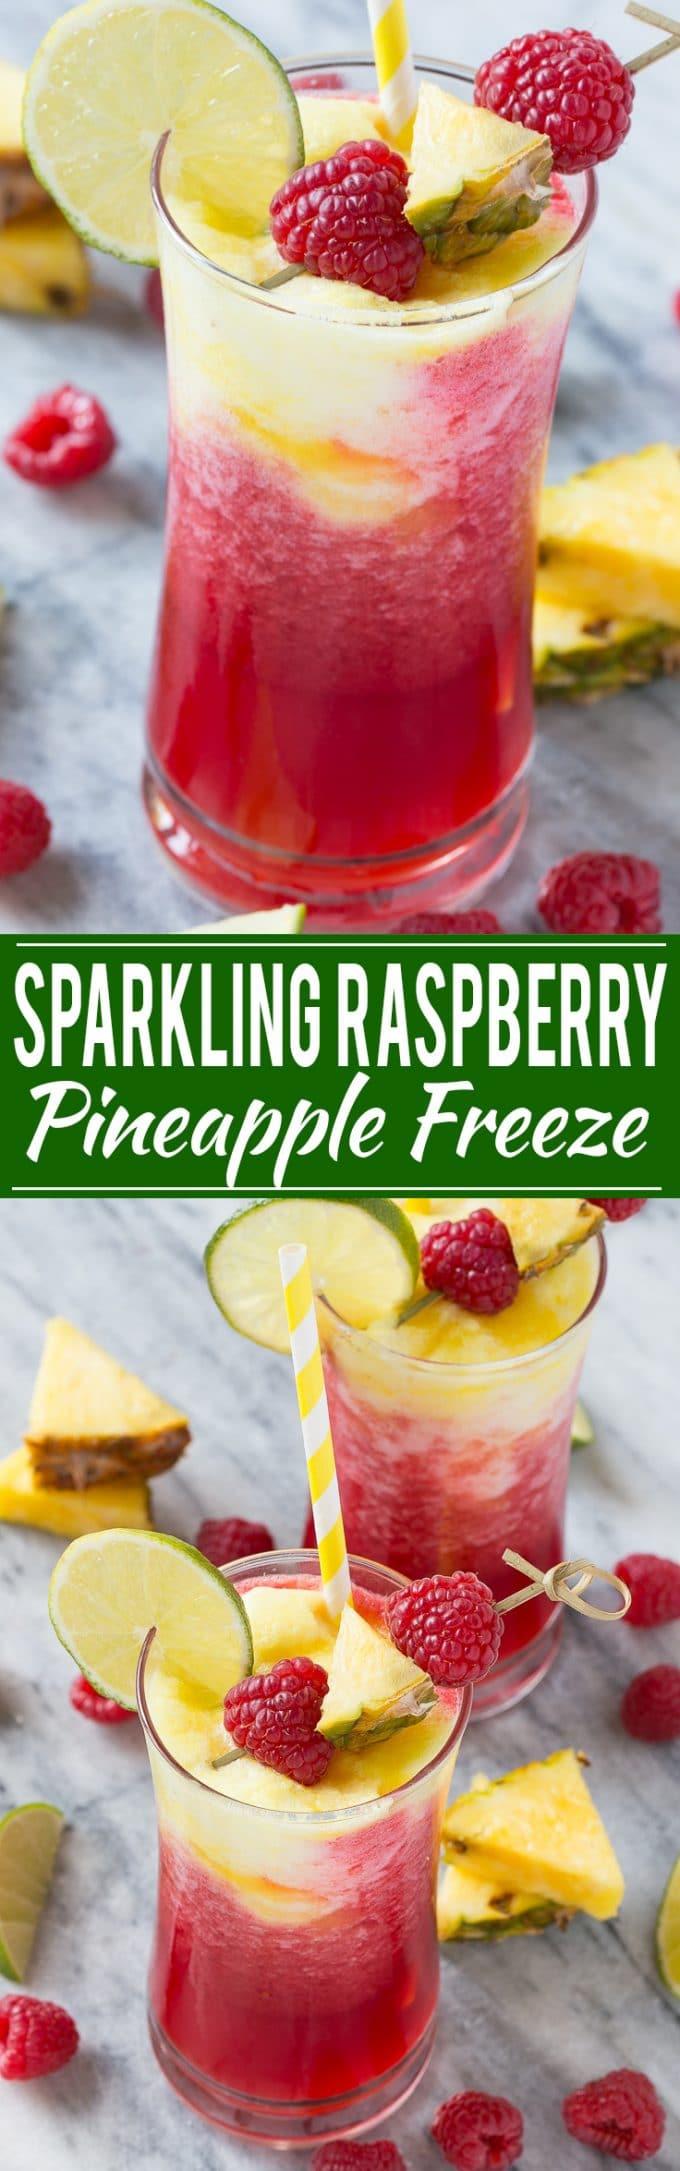 Sparkling Raspberry Pineapple Freeze Recipe   Raspberry Pineapple Freeze   Raspberry Pineapple Smoothie   Fruit Freeze Drink